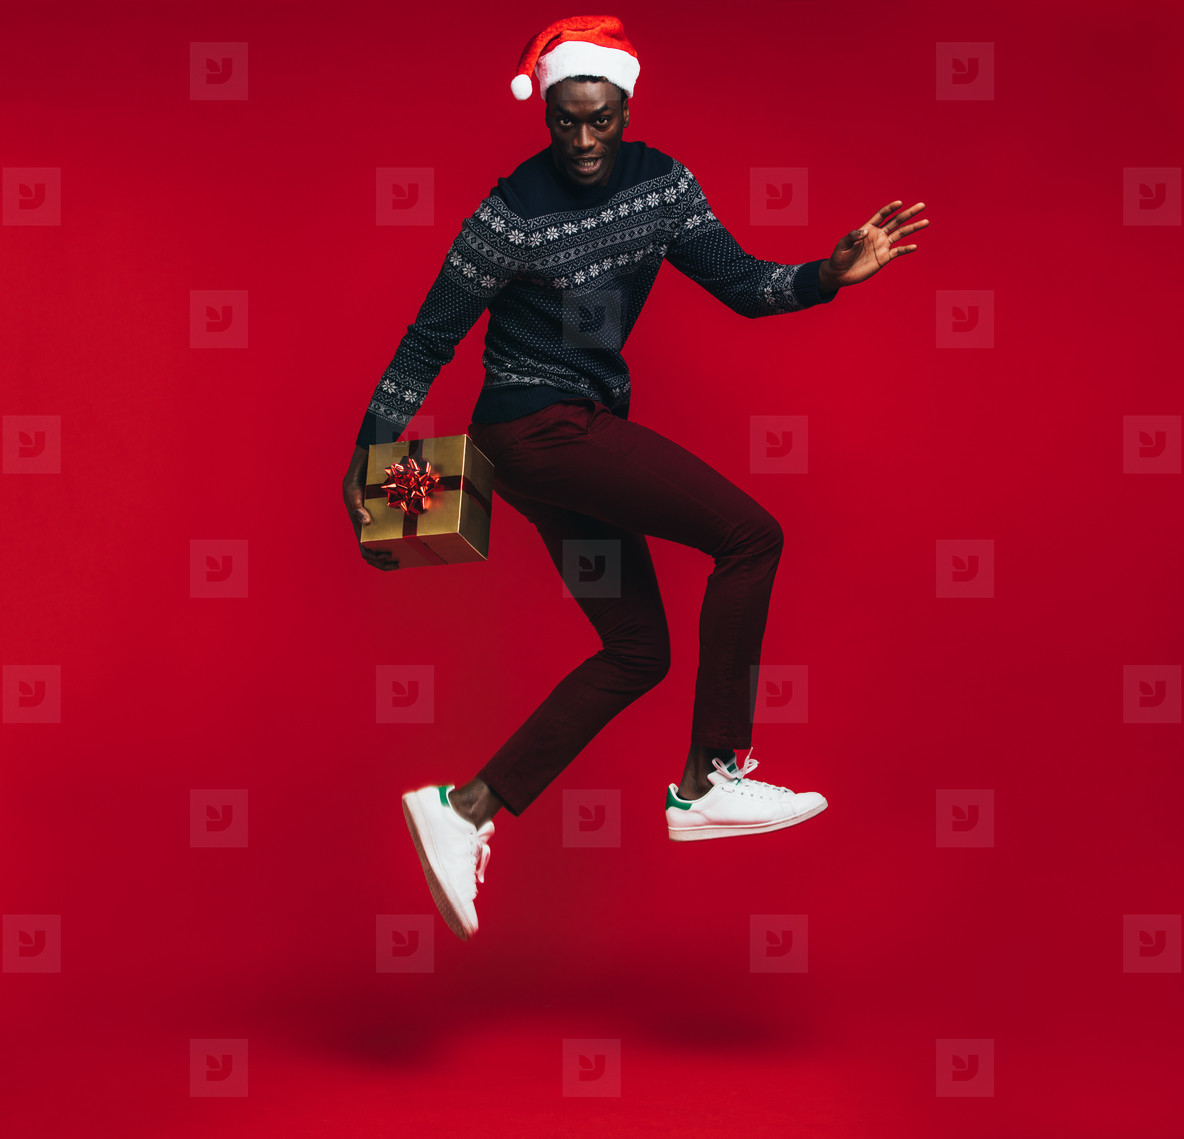 Stylish man jumping with christmas present